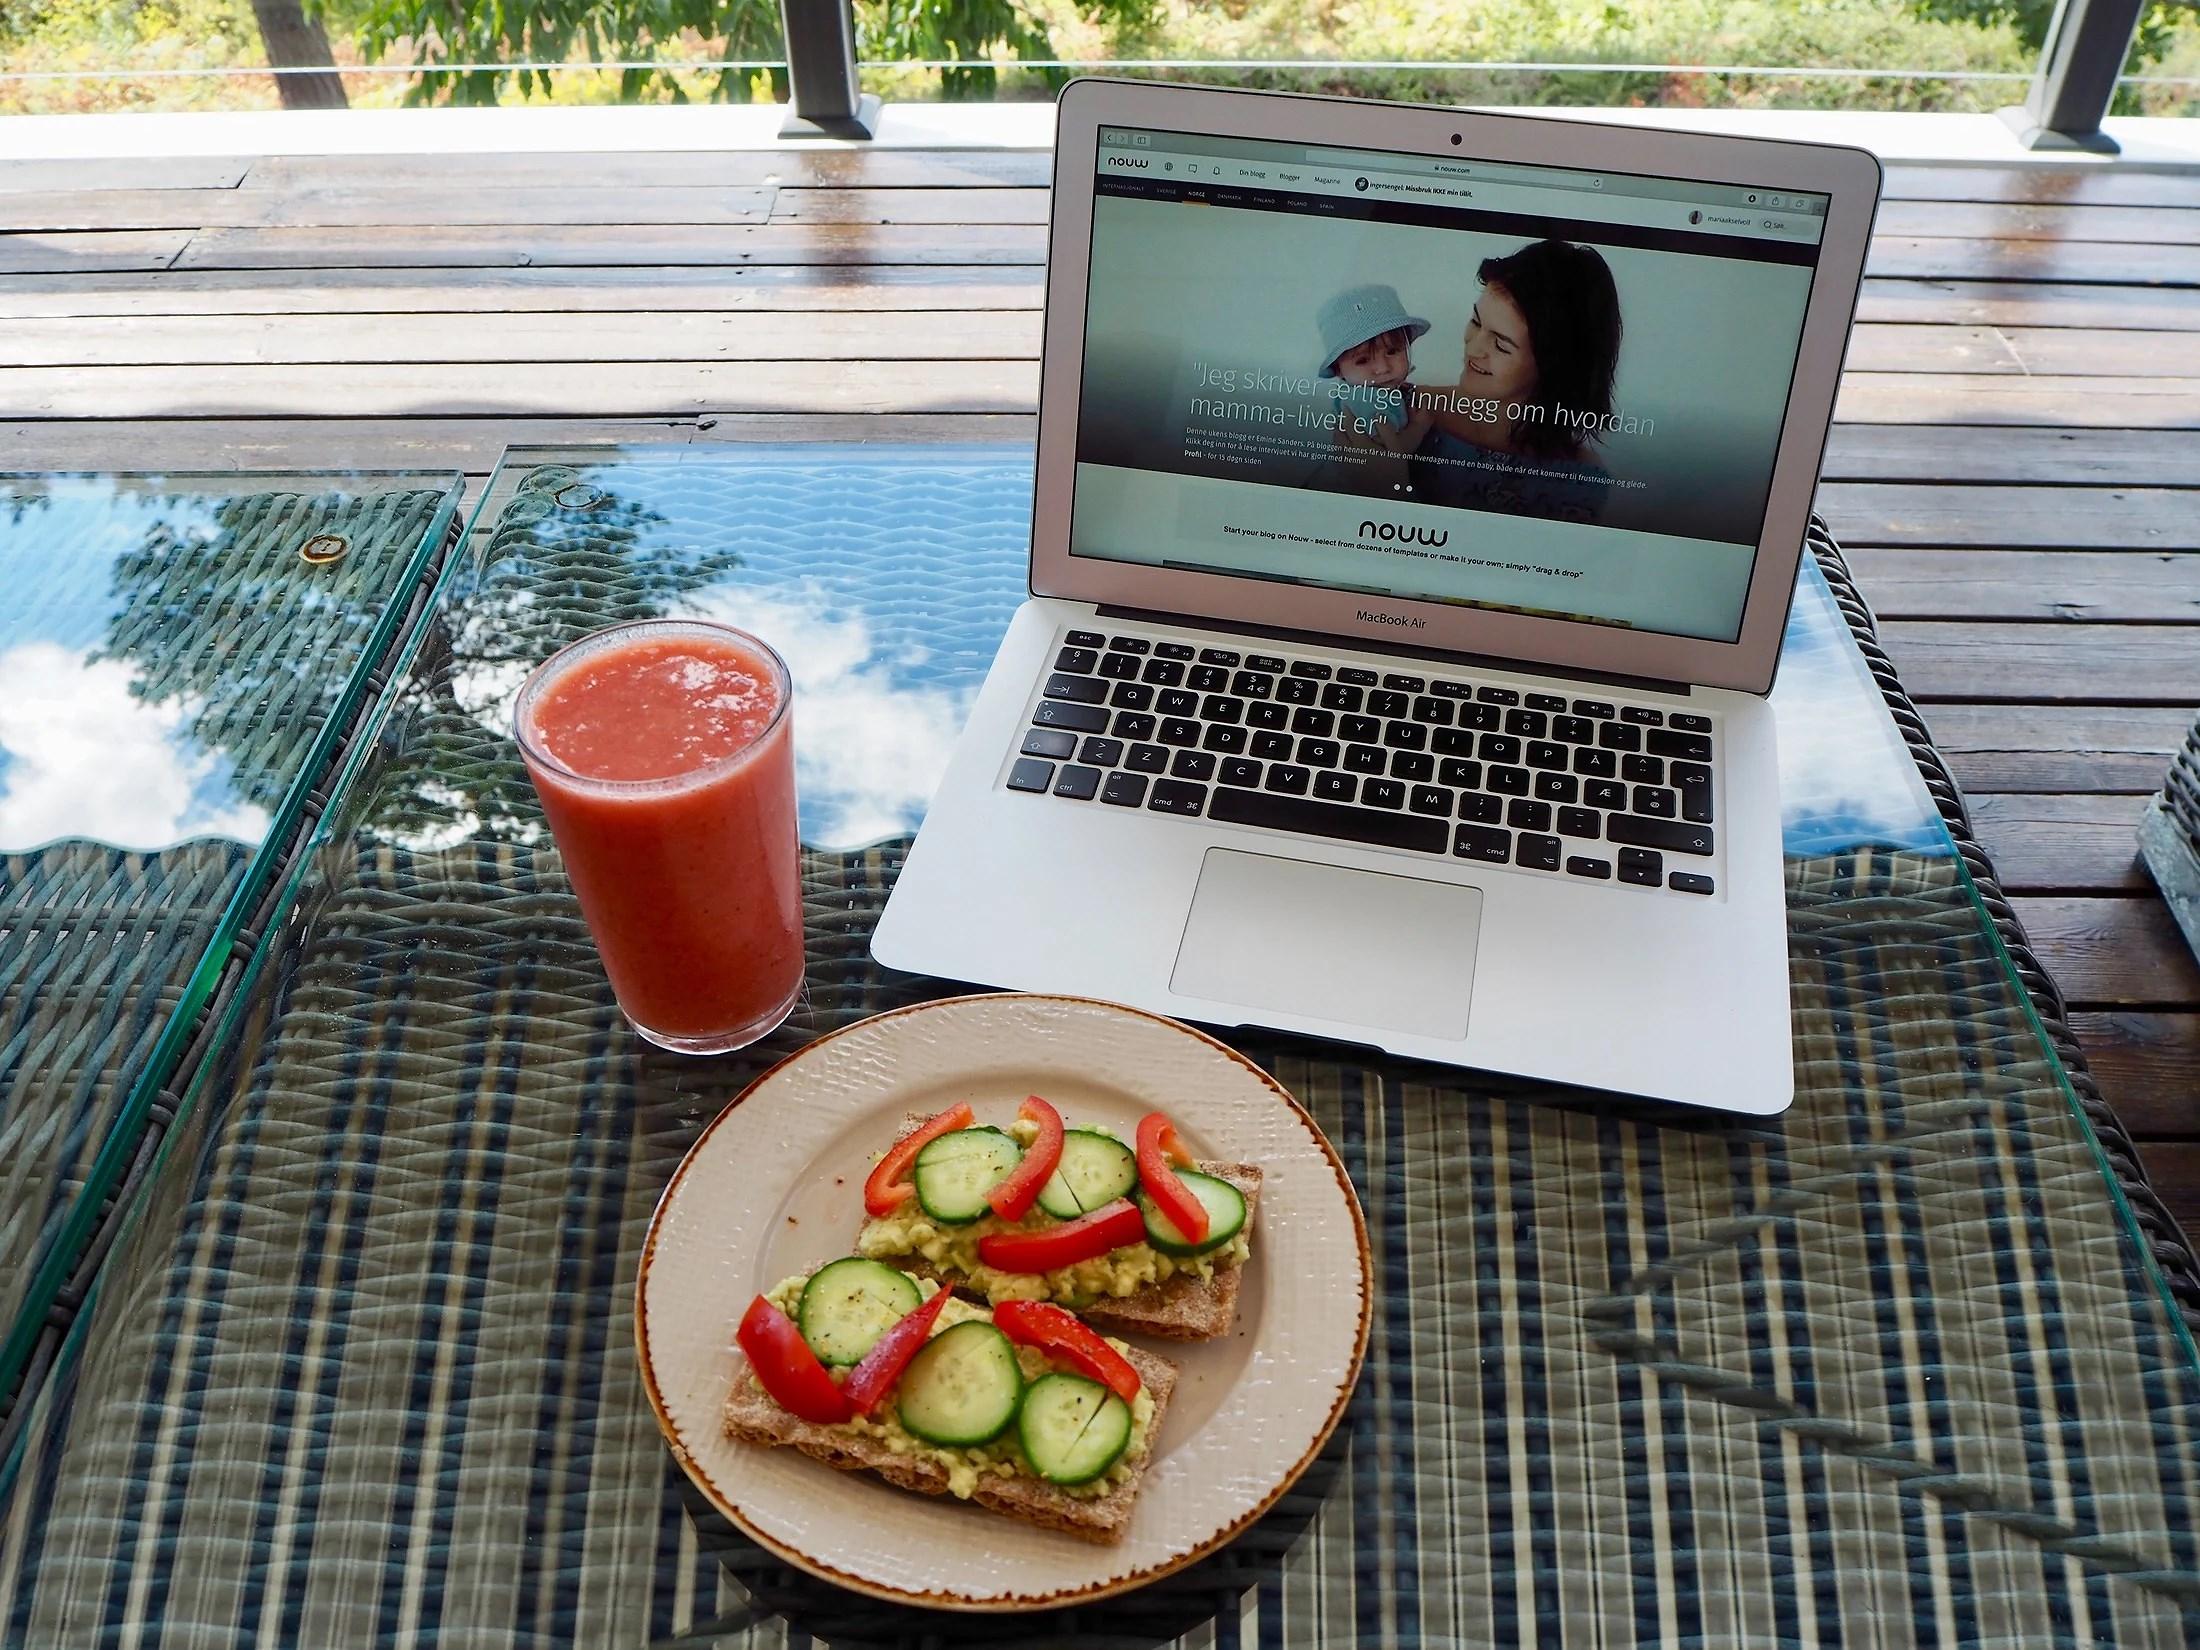 Avocado til lunsj